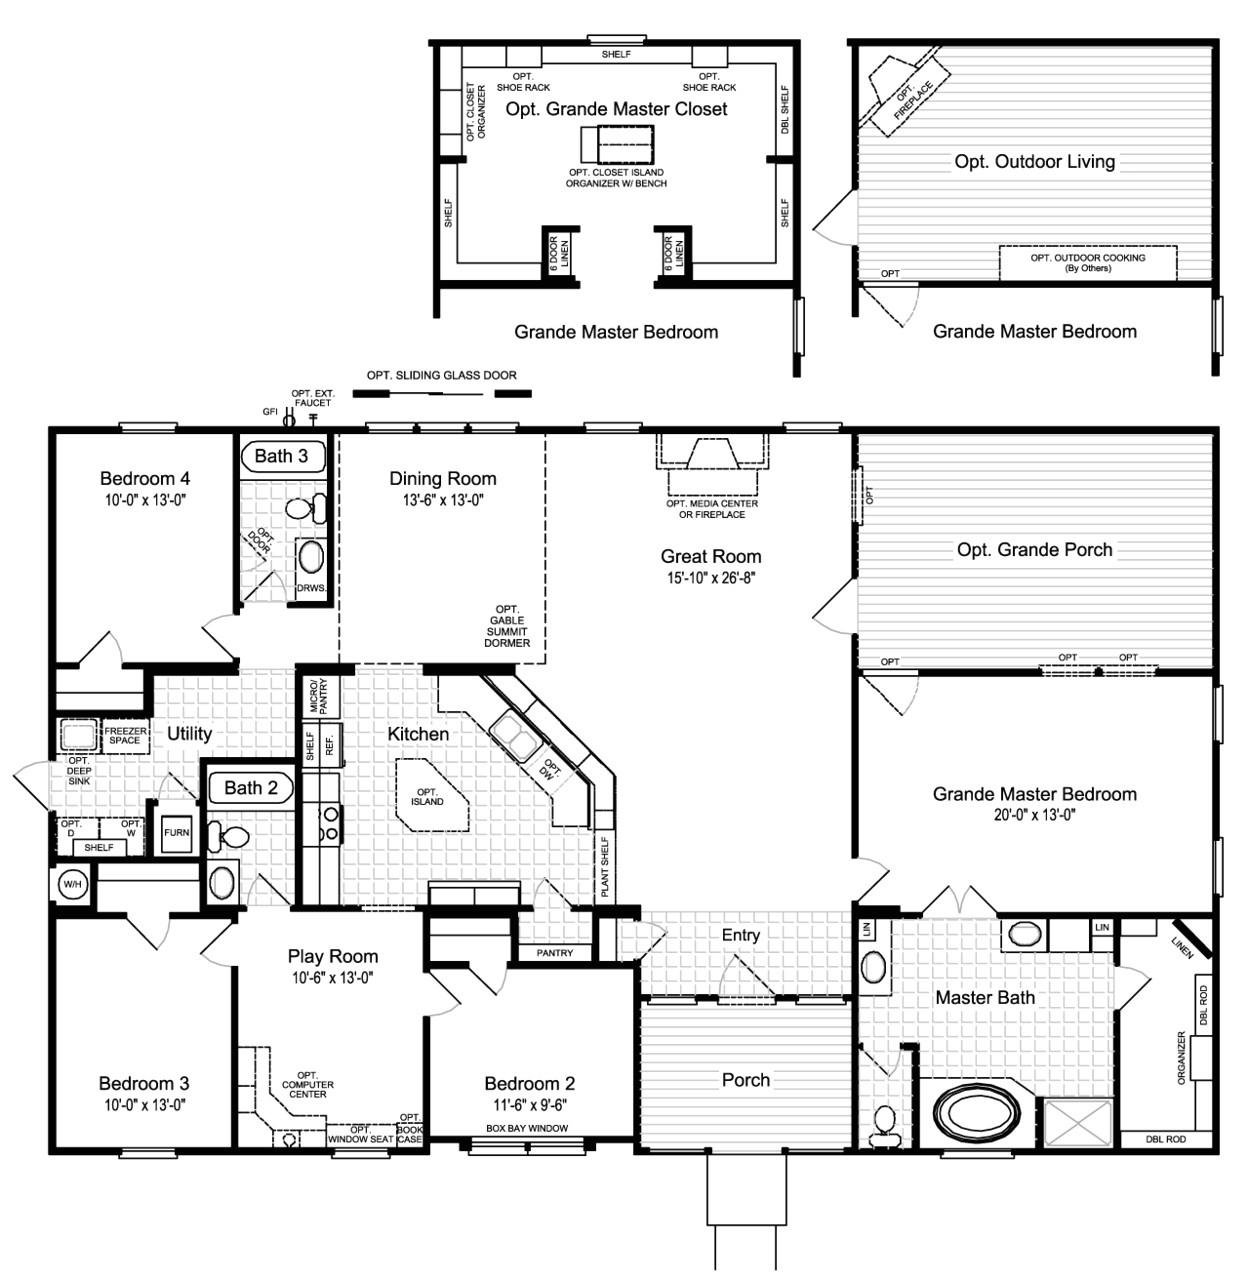 Palm Harbor Manufactured Homes Floor Plans Palm Harbor Homes Floor Plans Elegant the Hacienda Ii Vr A